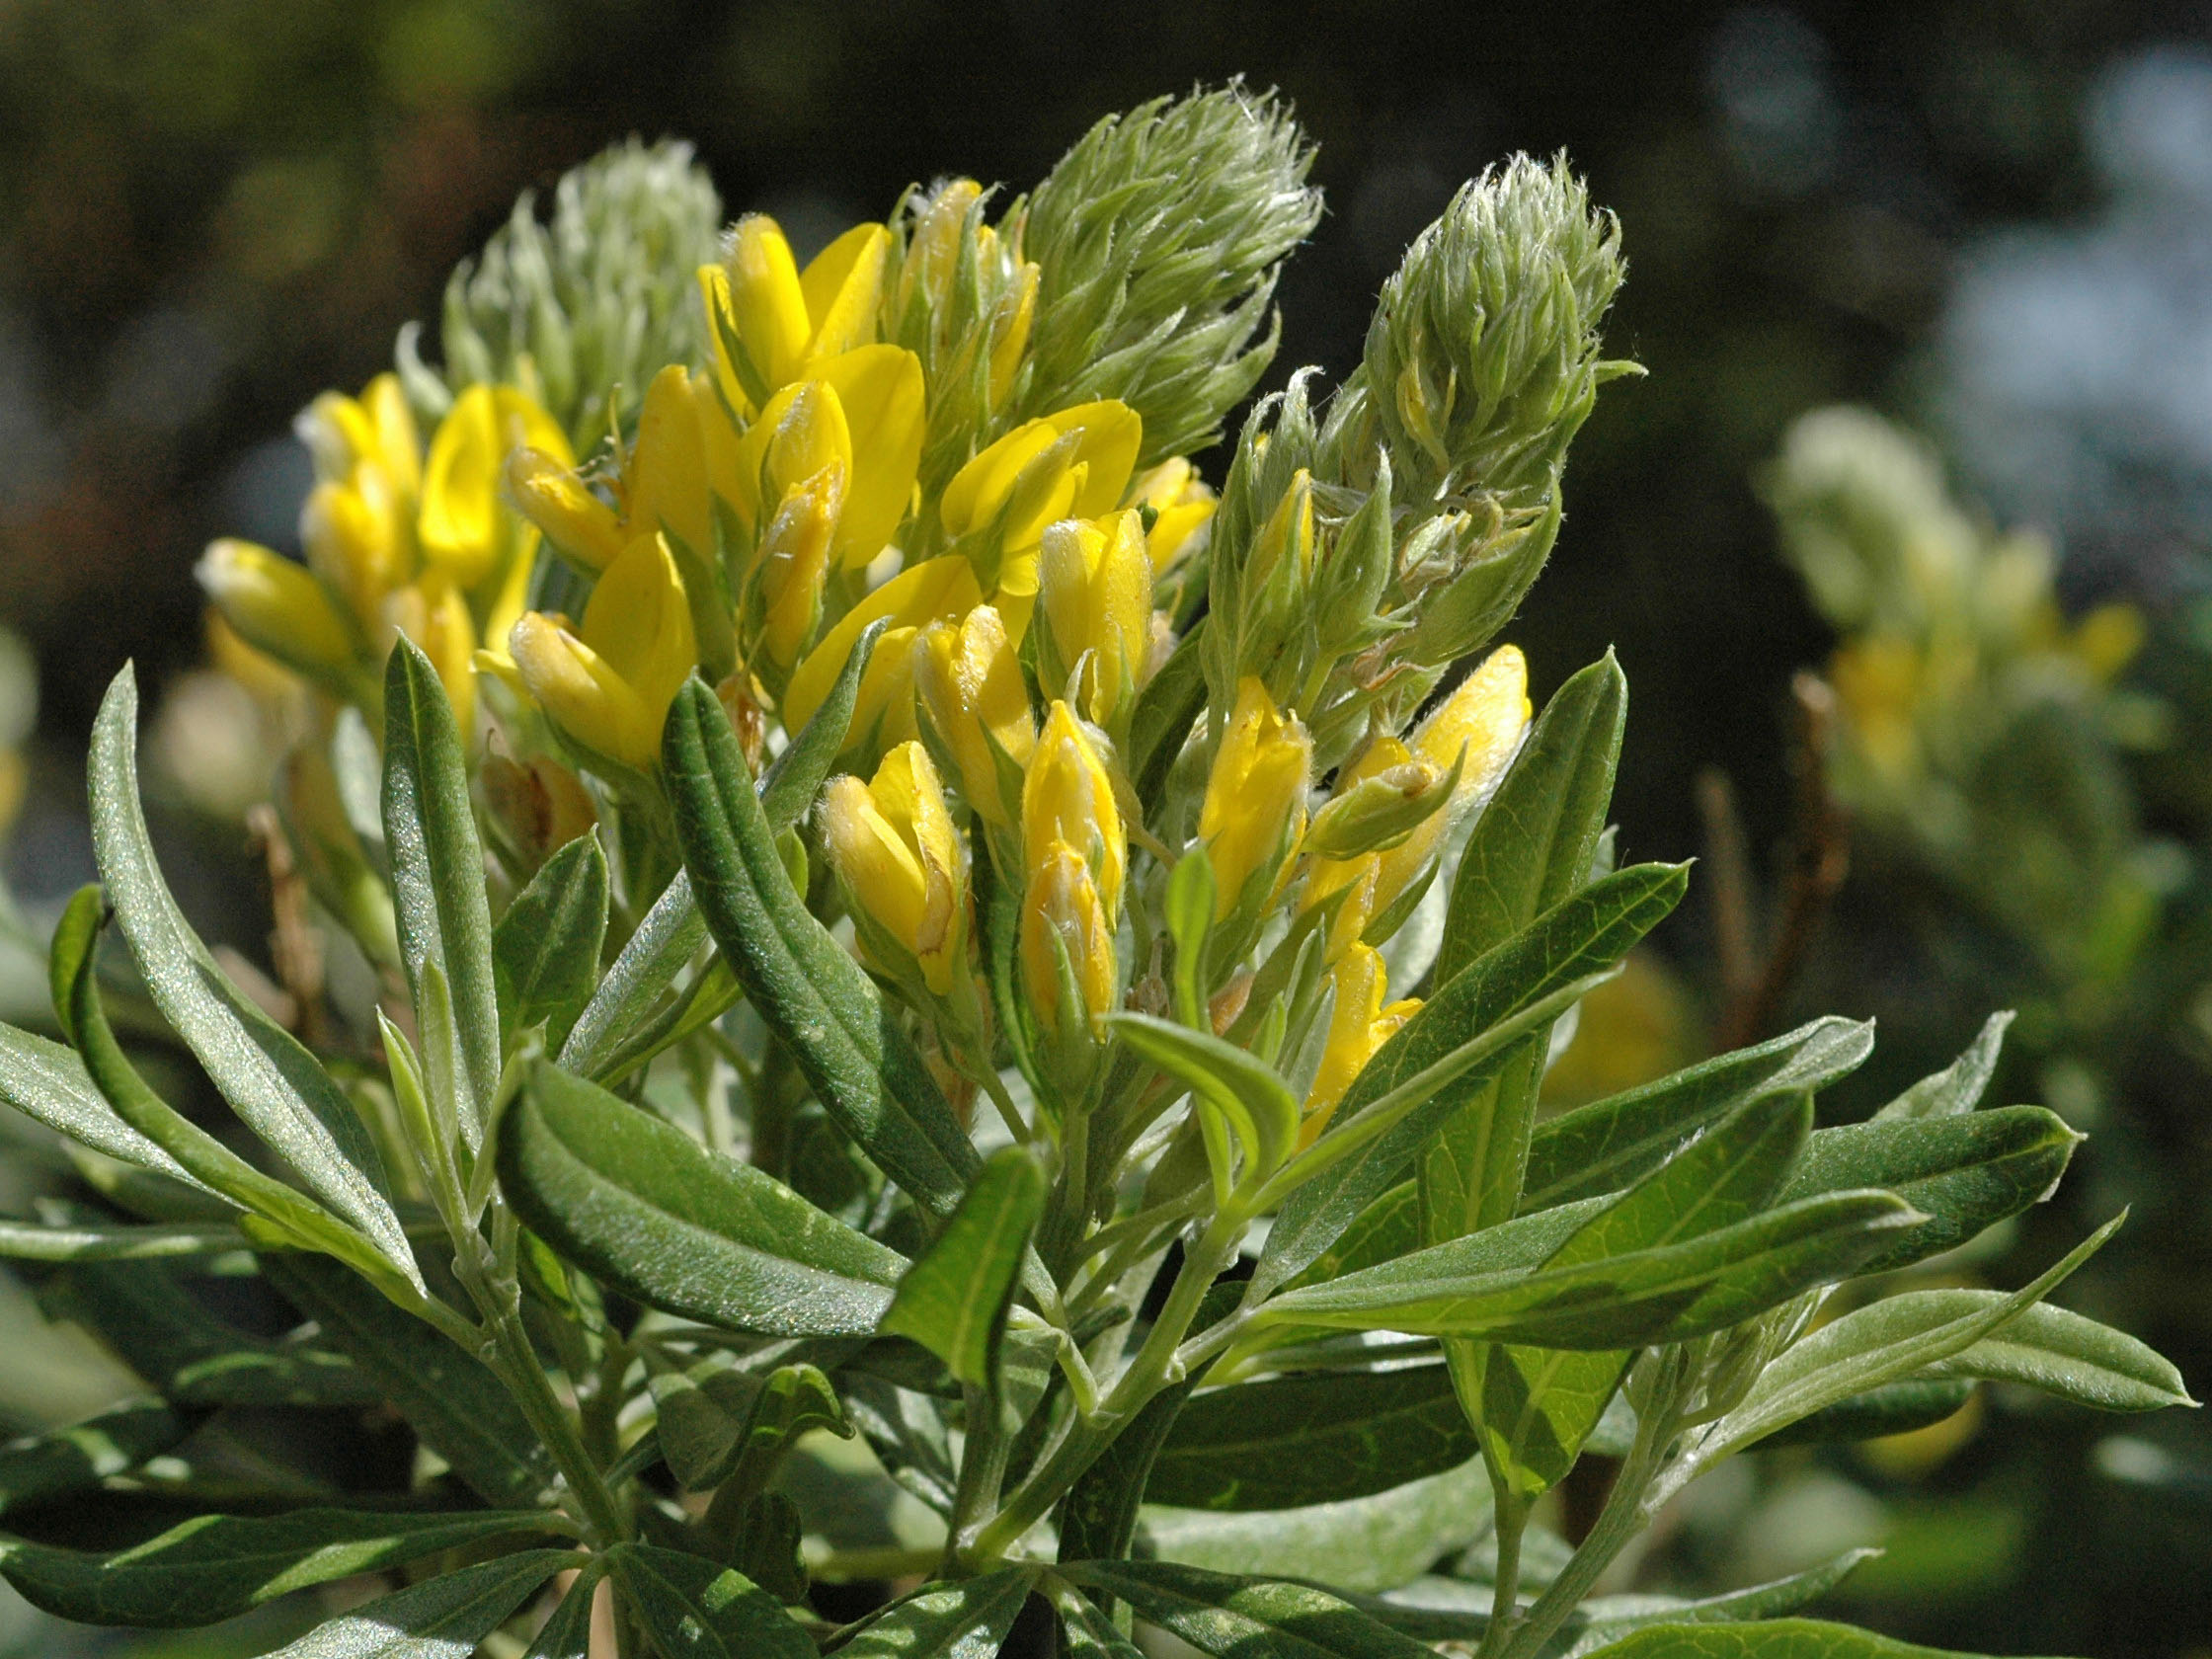 Teline linifolia